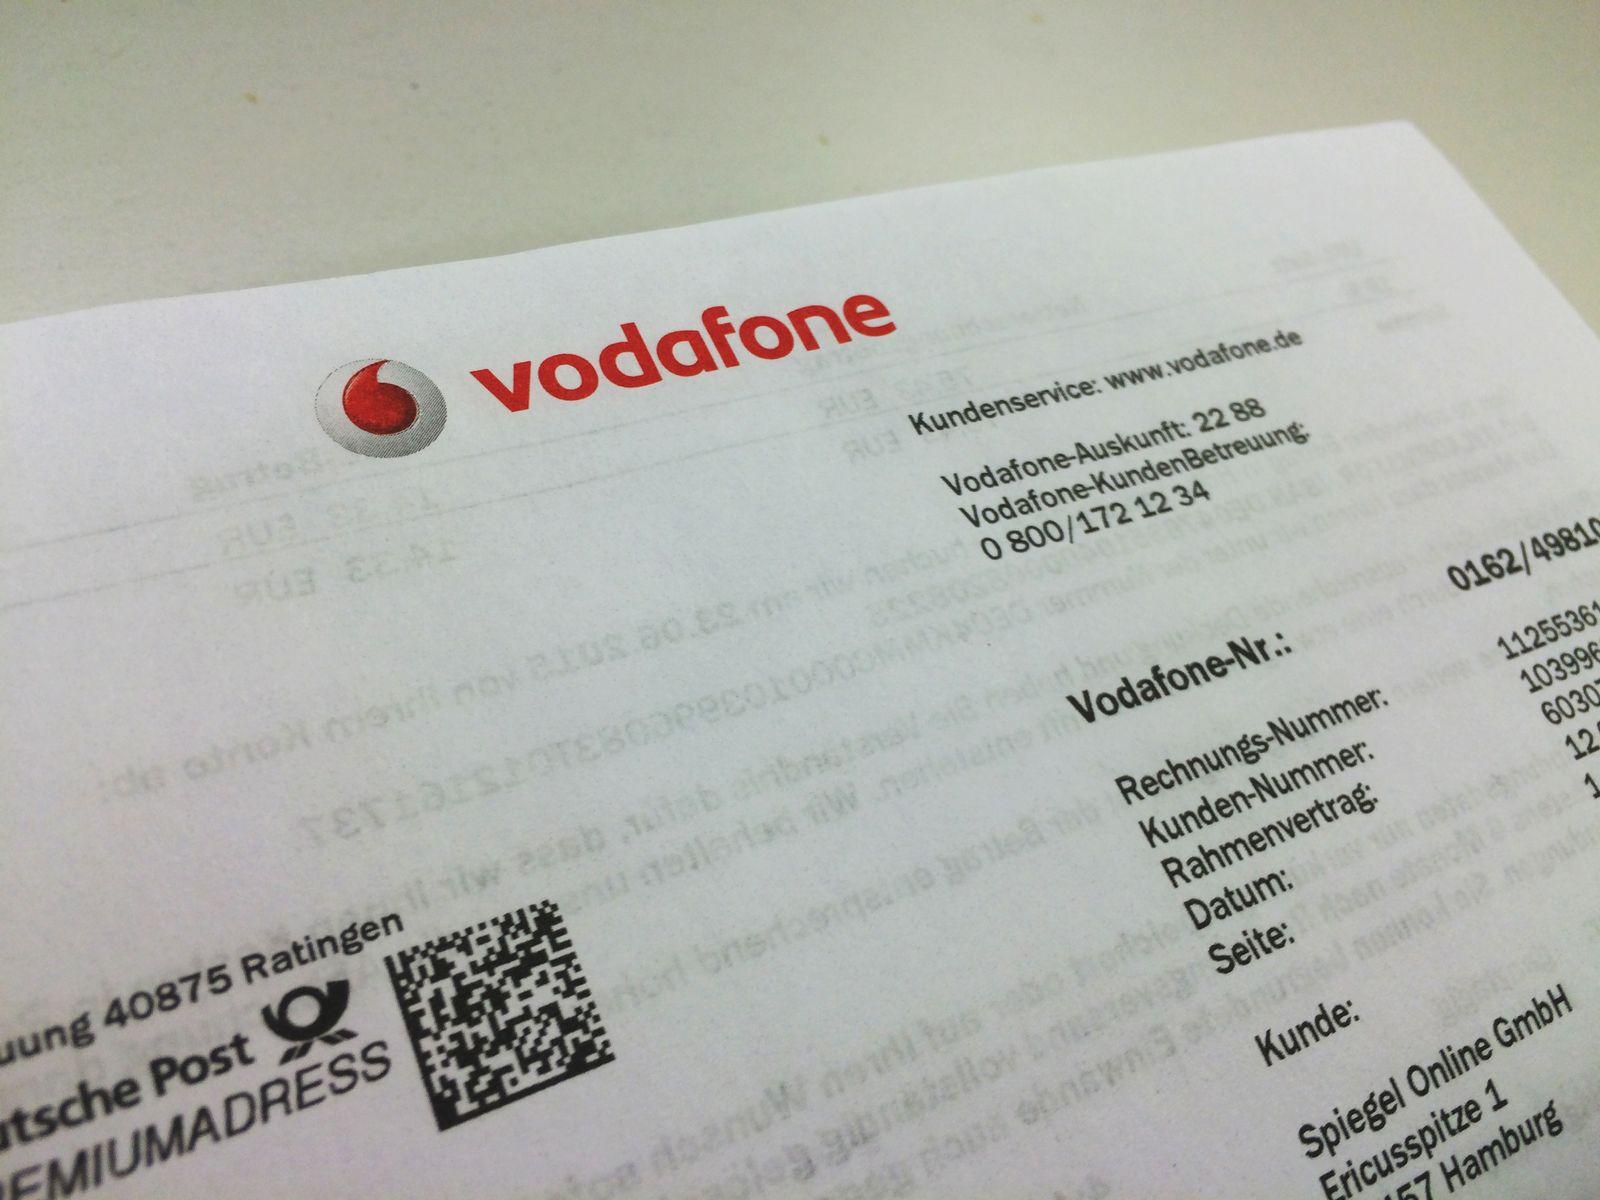 Vodafone Handy-Rechnung